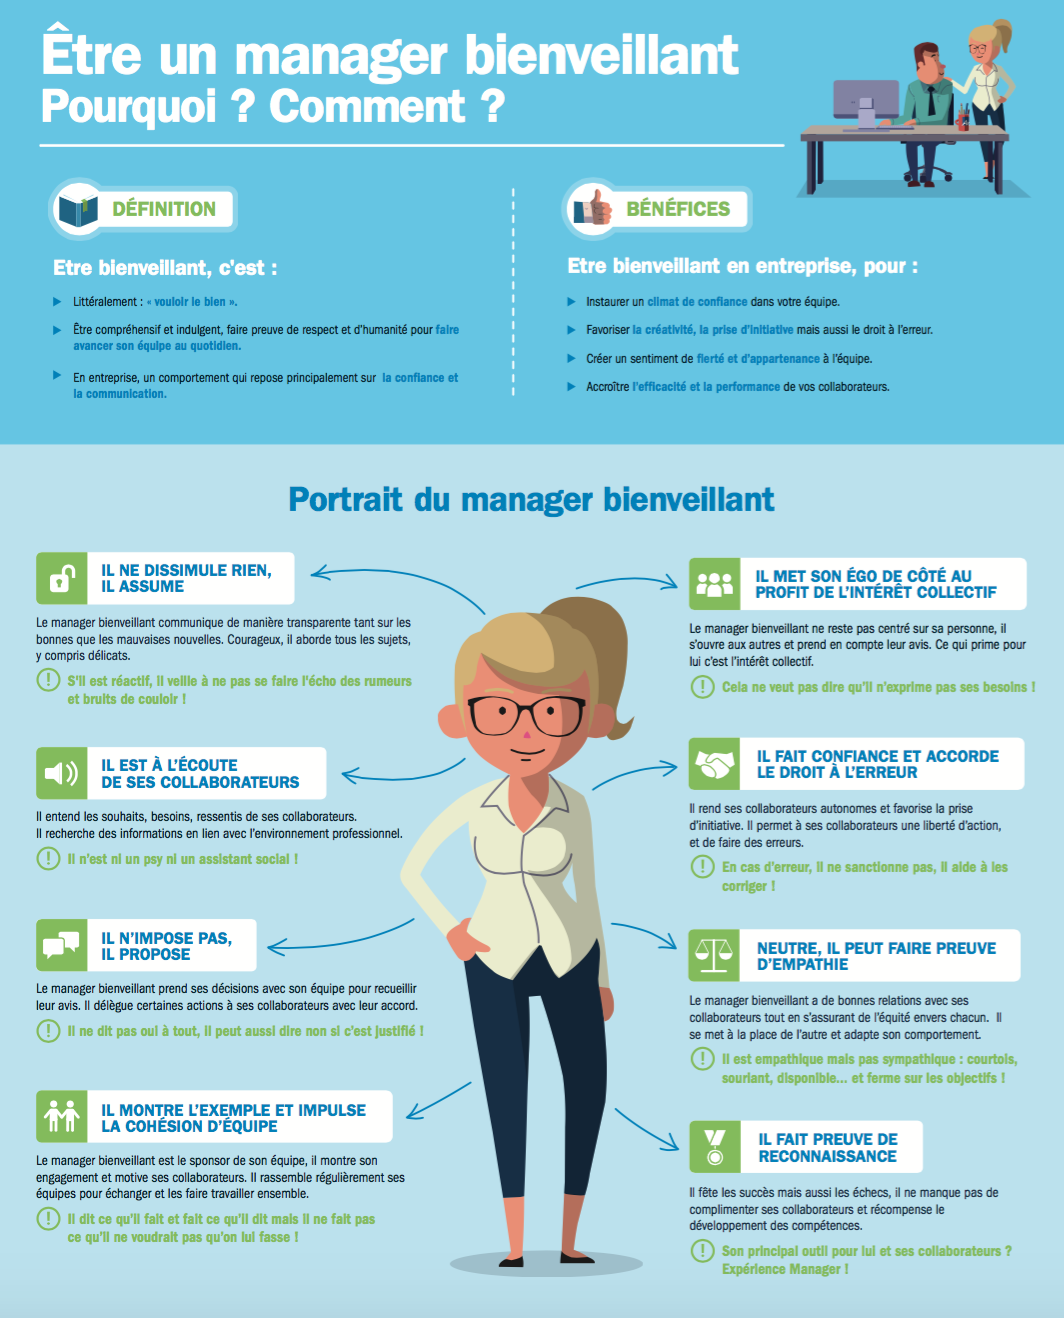 AXA infographie portrait manager bienveillant Wisdom Paris